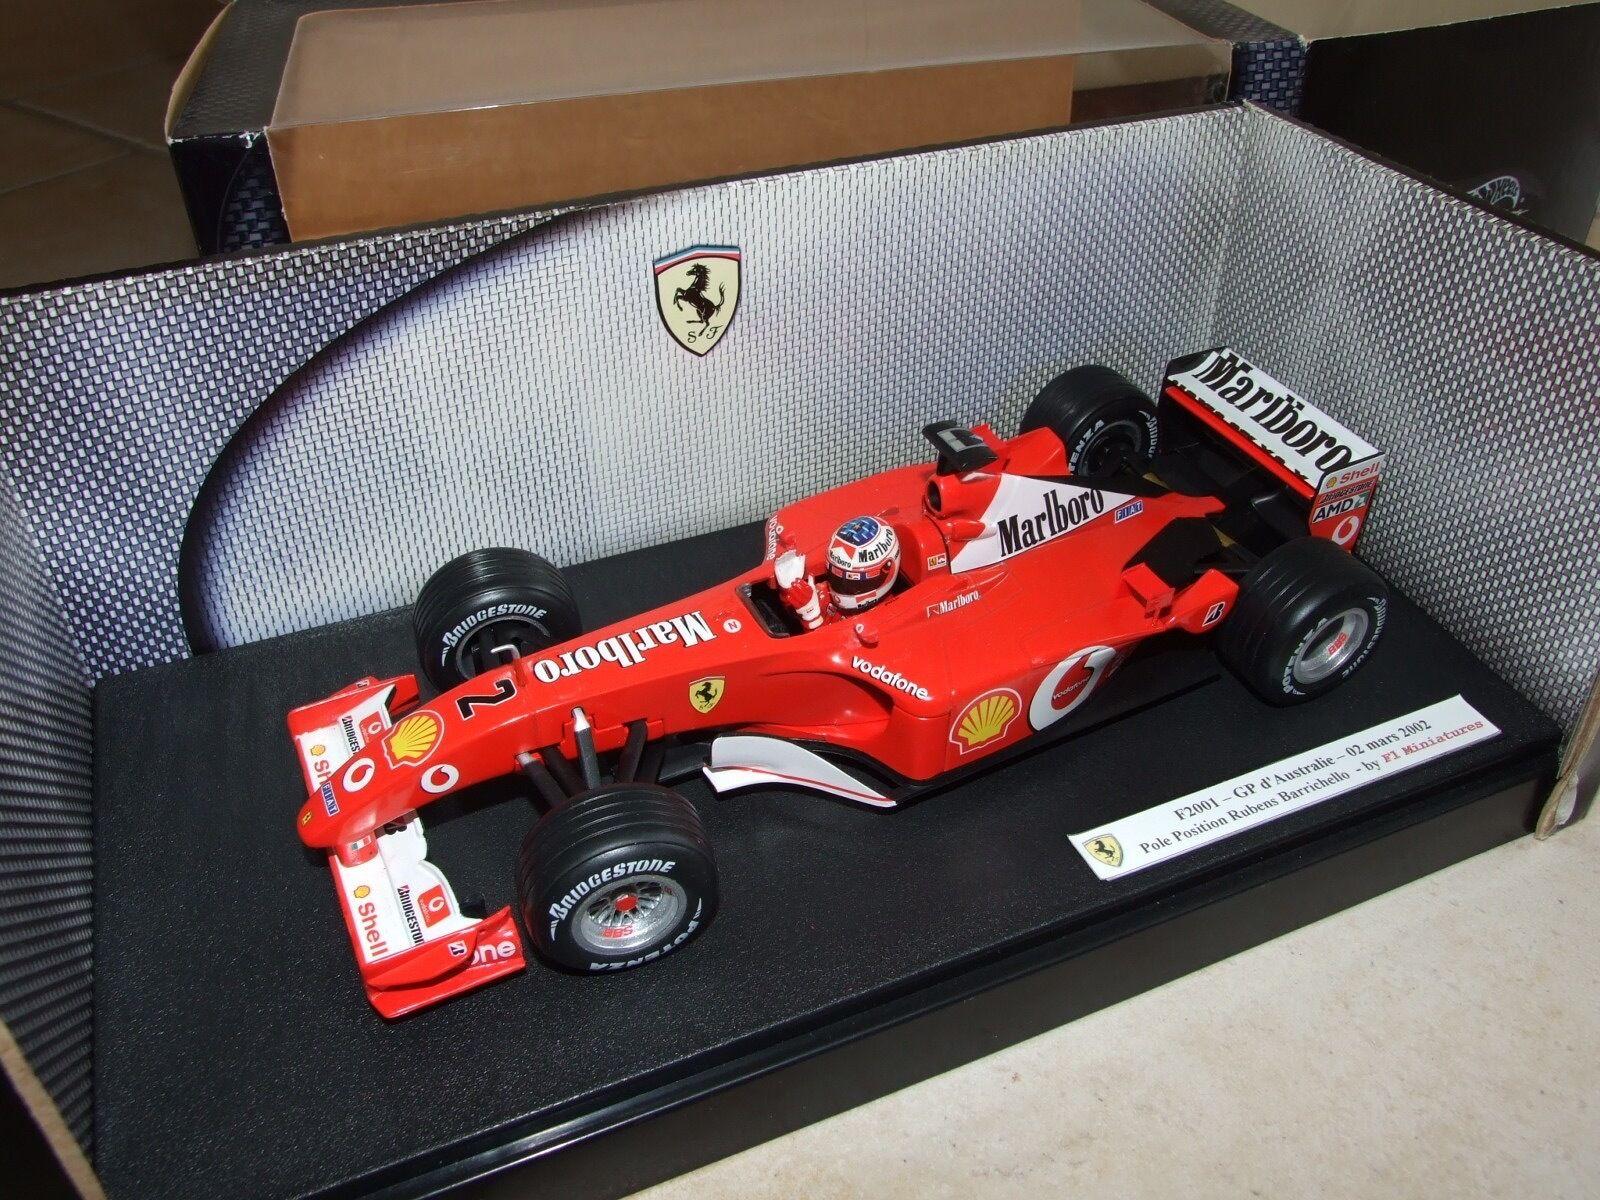 FERRARI F2001 GP AUSTRALIE 2001 BARRICHELLO Pole Positio HOTWHEELS 1 18 avec PUB